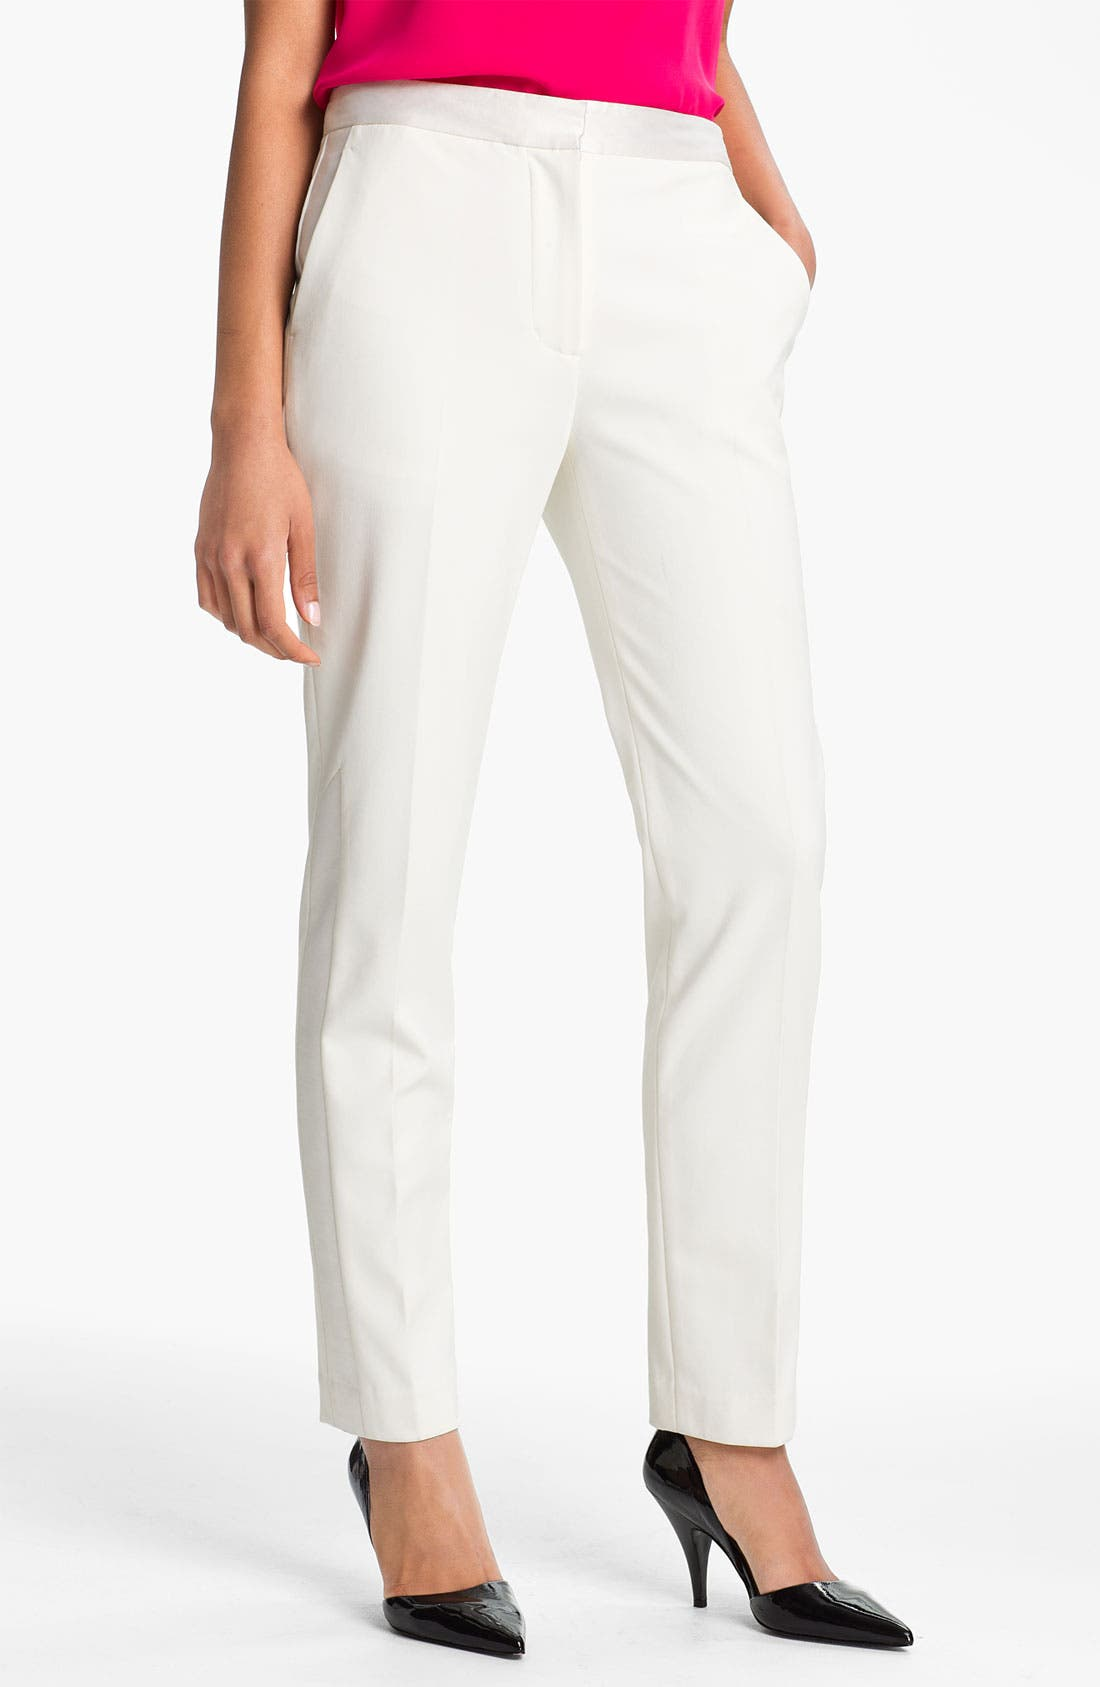 Main Image - 3.1 Phillip Lim Slim Tuxedo Pants